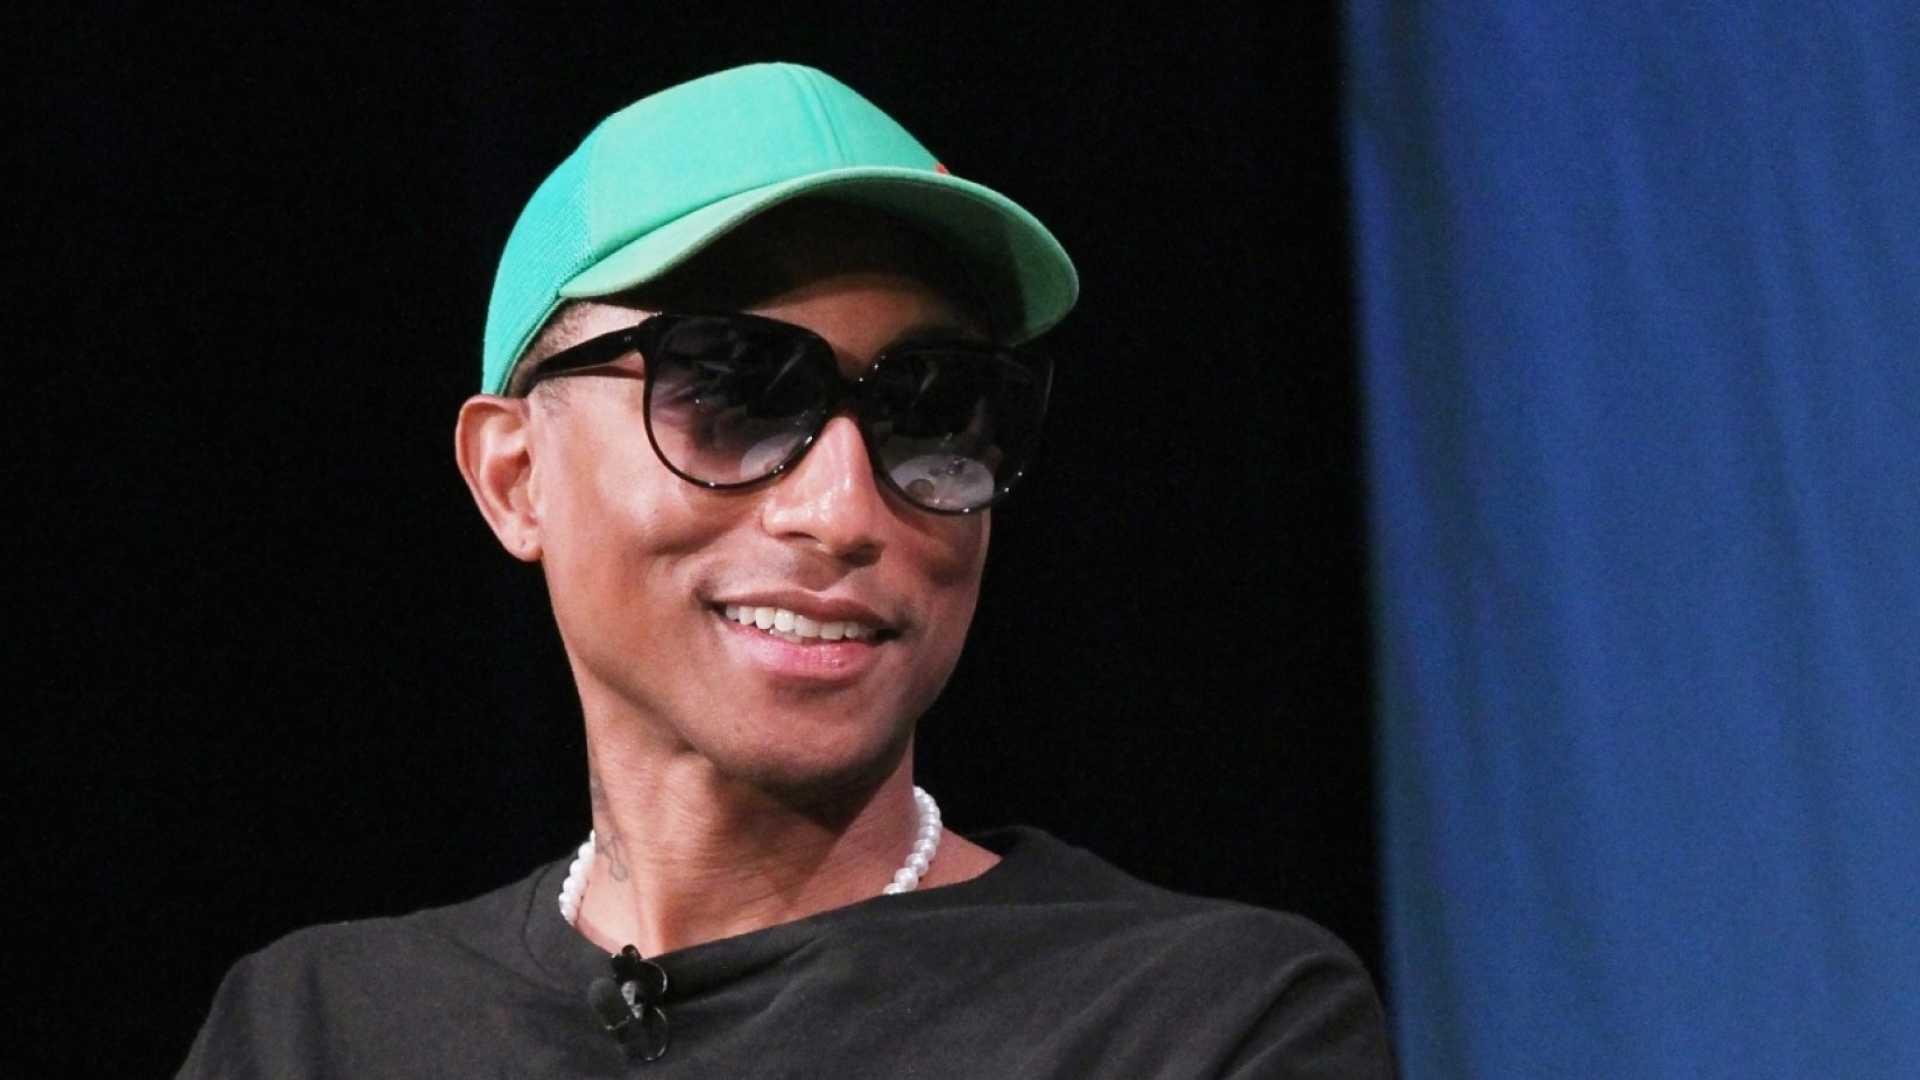 Pharrell Williams at the Fast Company Innovation Festival on October 24, 2018.